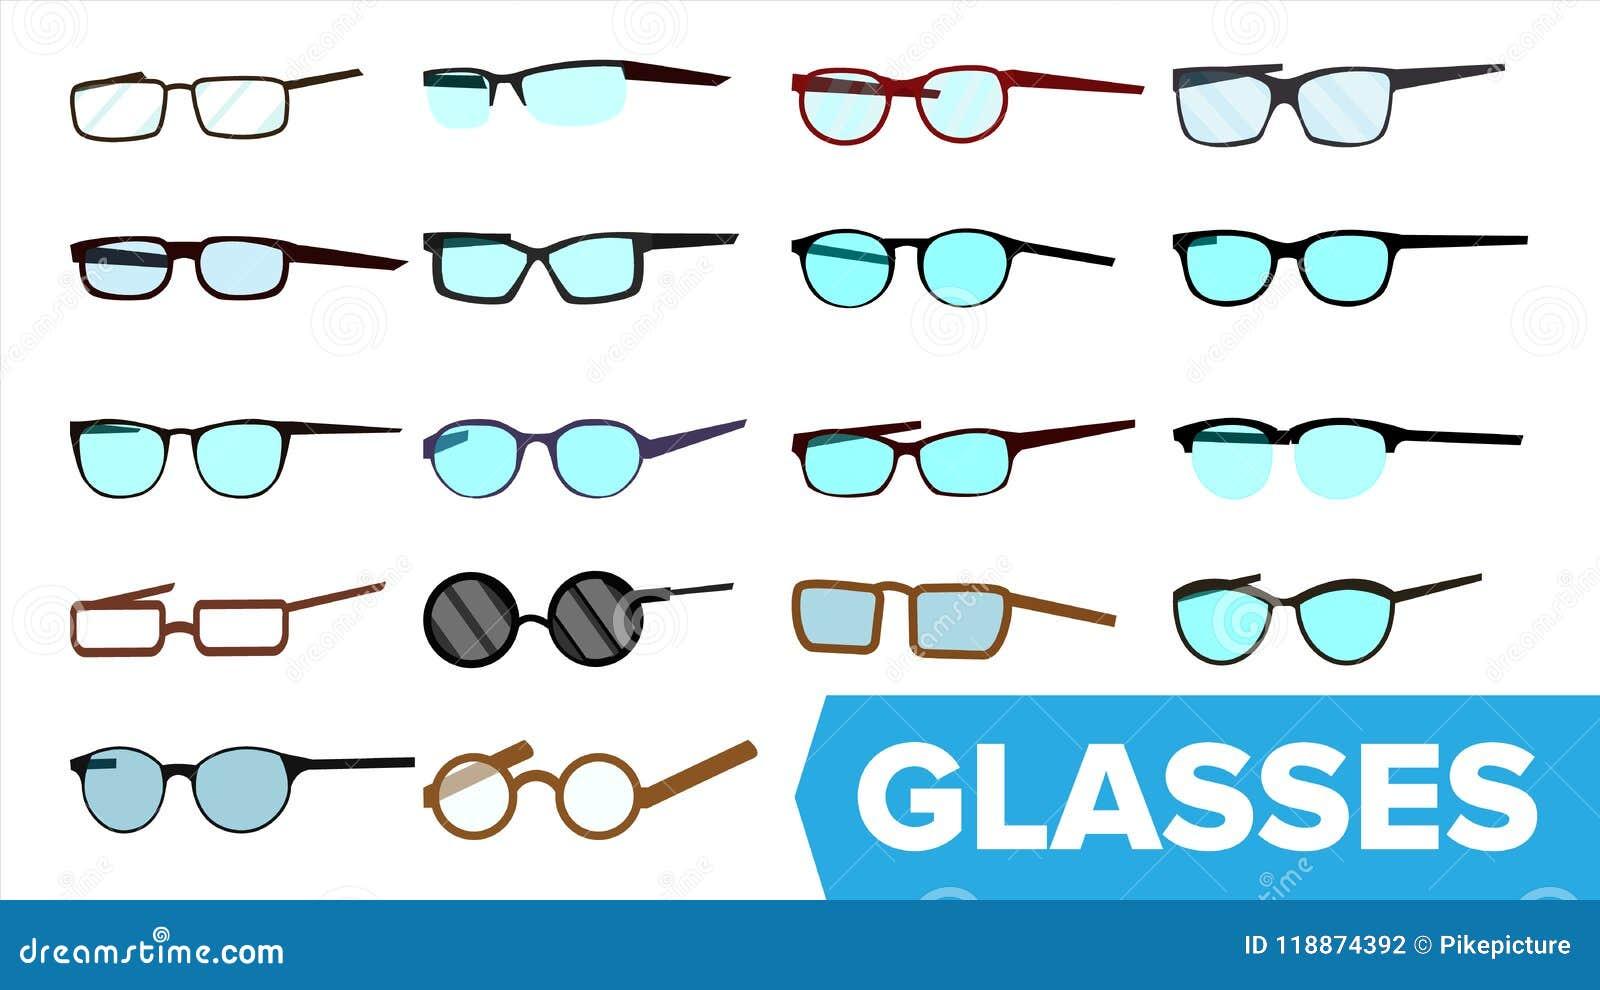 a4e87c8b00b Glasses Set Vector. Modern Glasses Icon. Different Eyewear Types. Eyeglasses  With Frame. Blue Lense. Cartoon Isolated Illustration